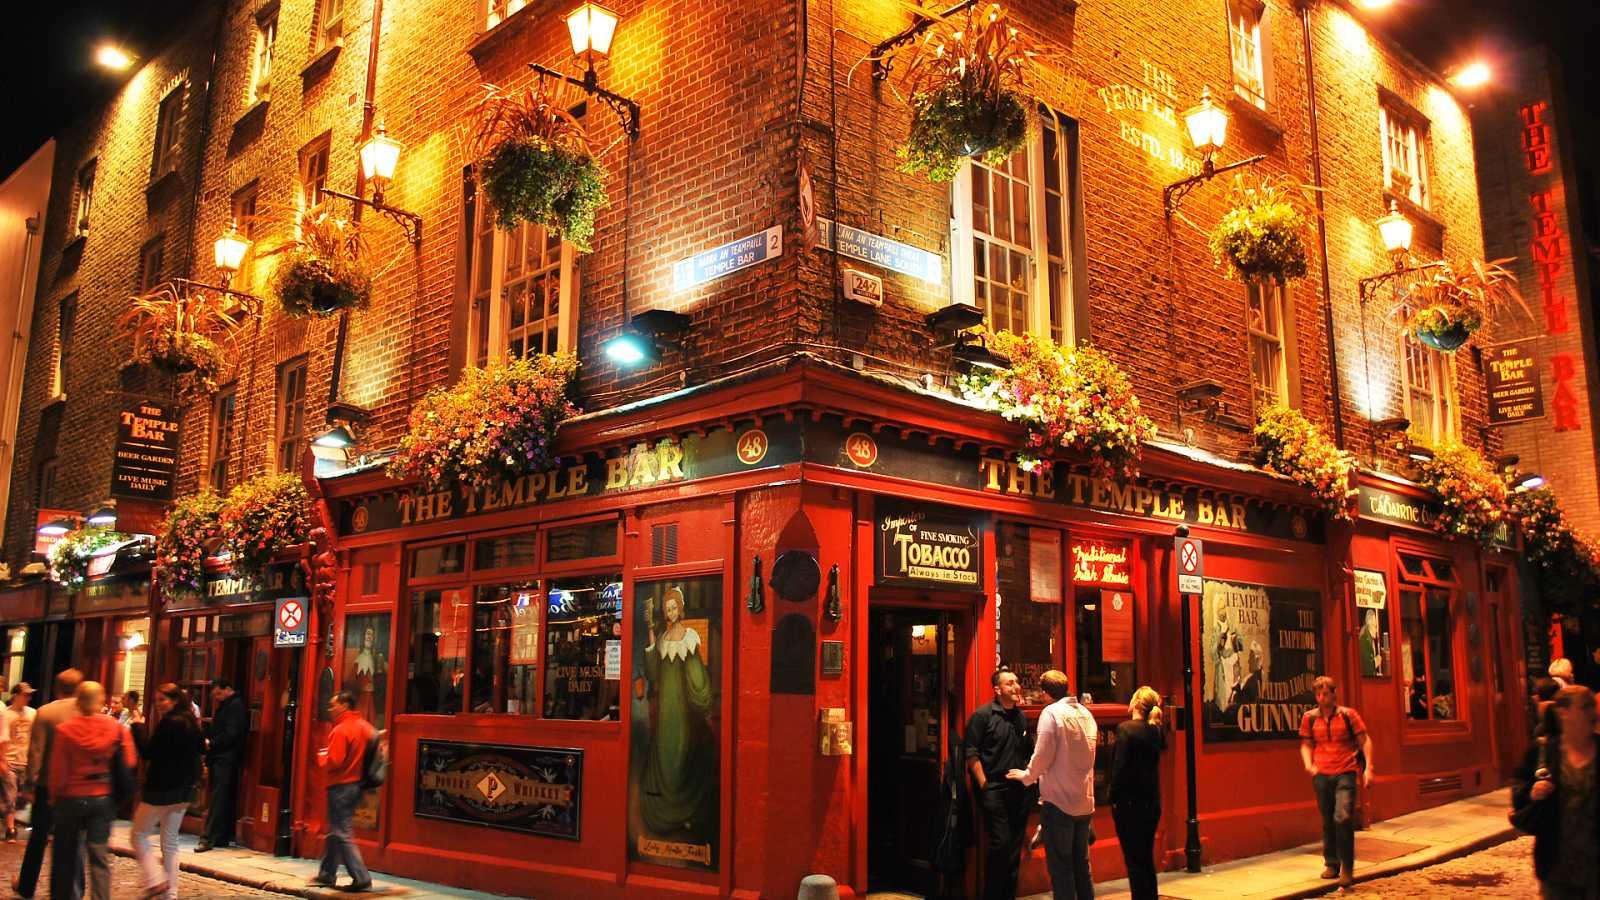 Cinco pistas - ¡Vamos a Dublín! - 16/03/21 - Escuchar ahora